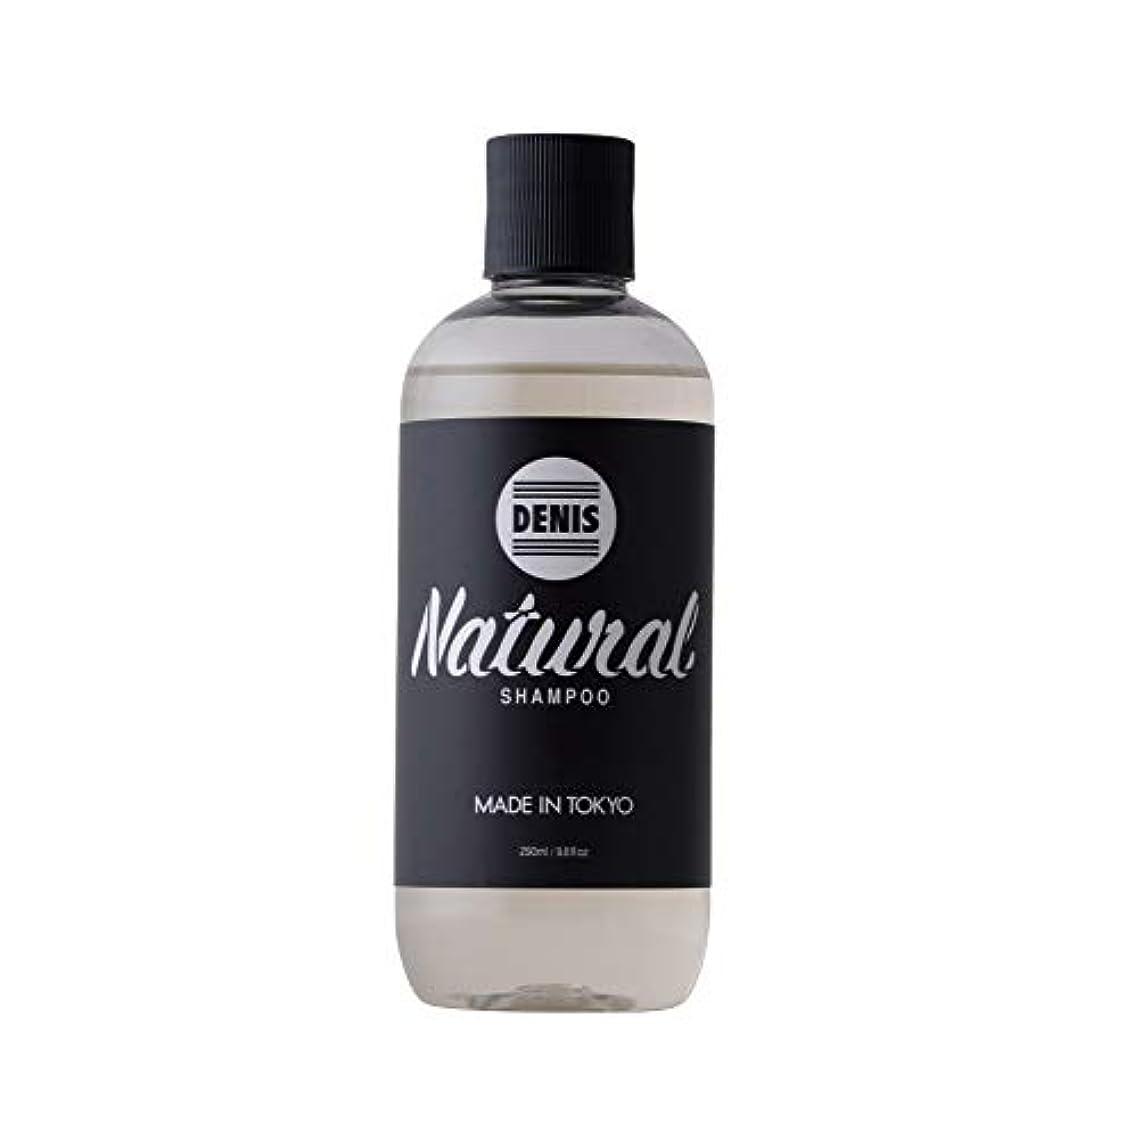 DENIS NATURAL SHAMPOO 290ml デニス ナチュラル シャンプー 【 りんごアミノ酸使用/セージの香 】